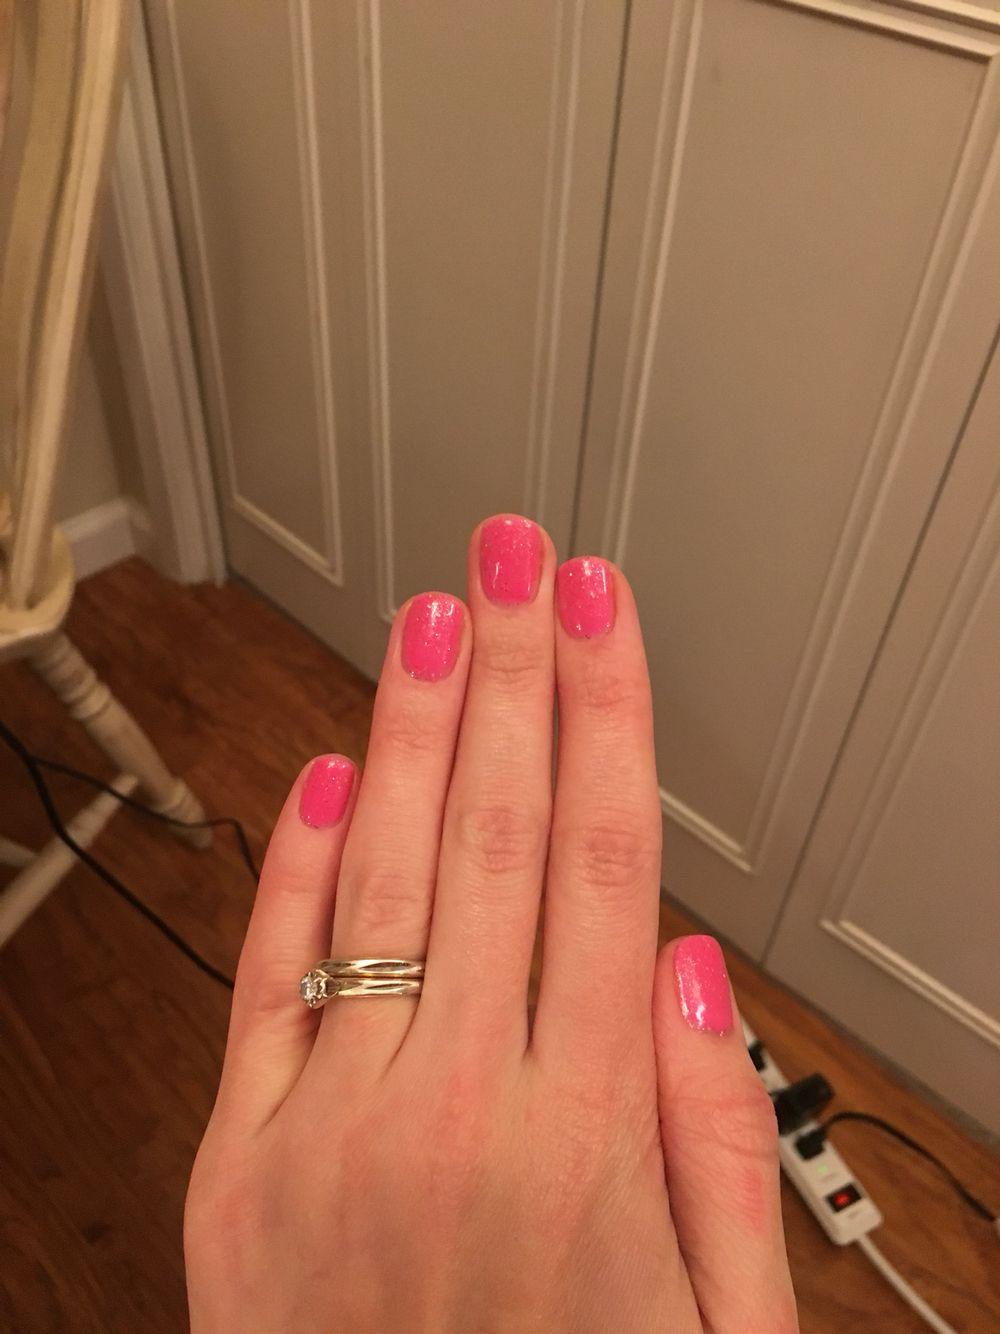 LeChat nails gel polish sweetheart glitter | Gel nail ...